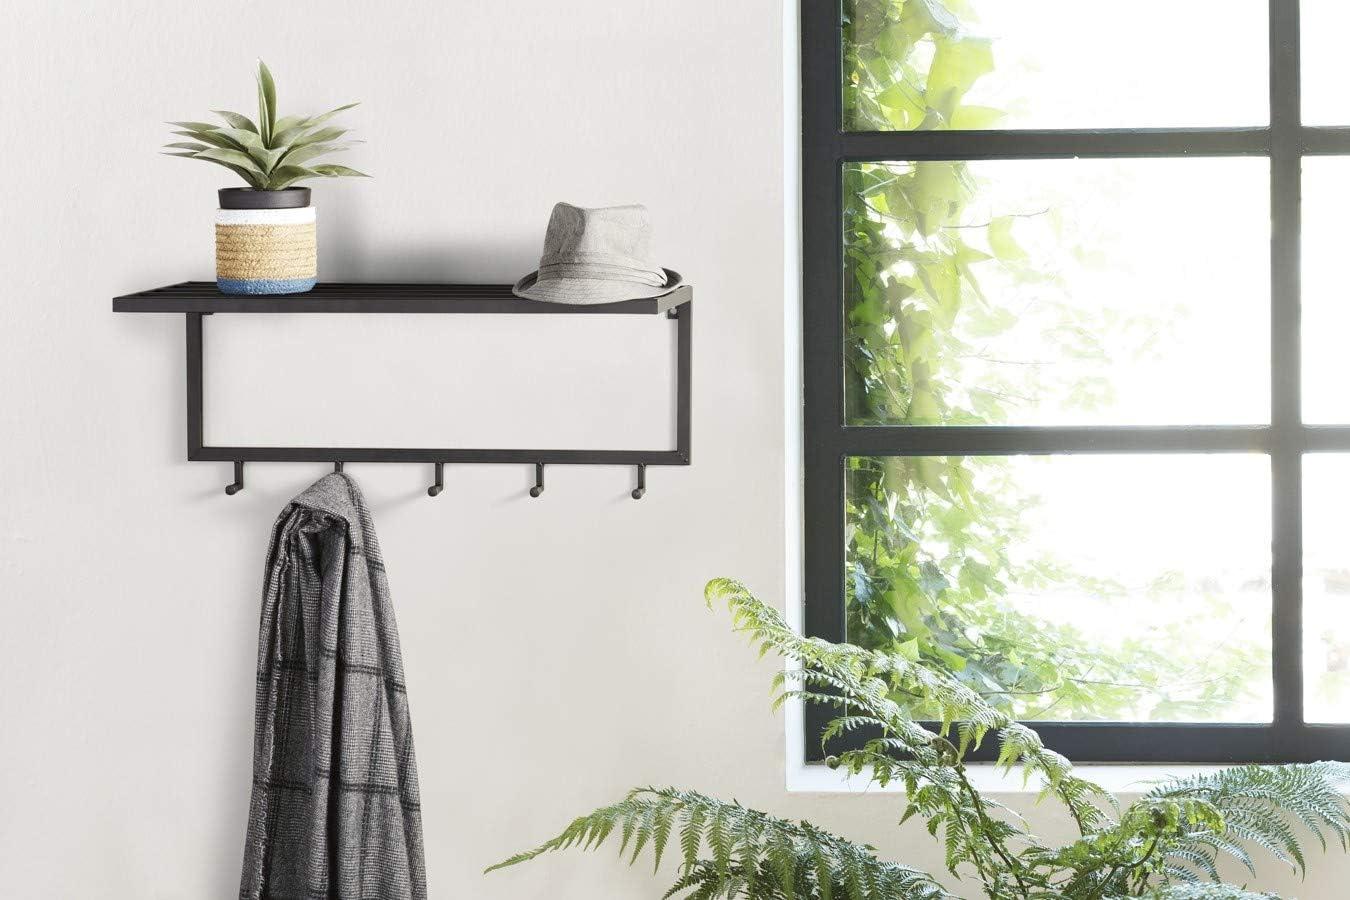 75 x 26 x 30 cm Black Wall Mounted Hooks with Shelf LIFA LIVING Wall Coat Rack Metal Shelving Bedroom Hook Rack for Hallway Entryway Vintage Jacket Storage